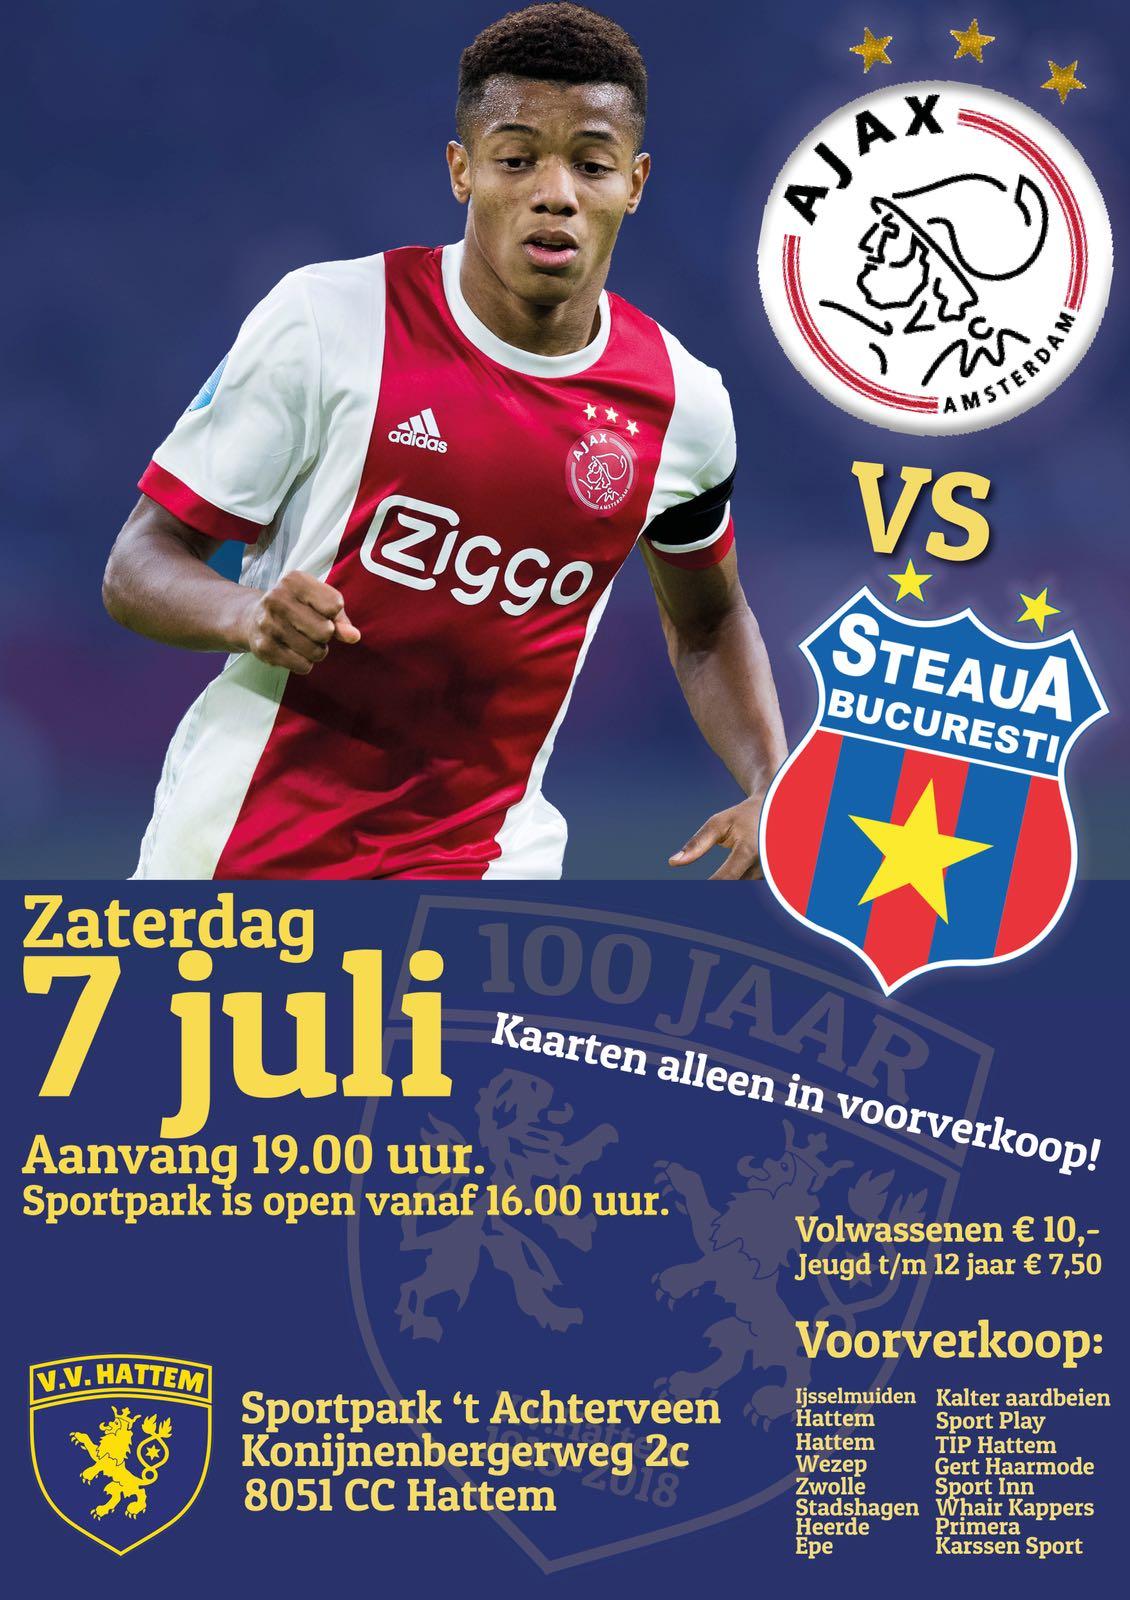 Ajax en Steaua te gast bij v.v.Hattem